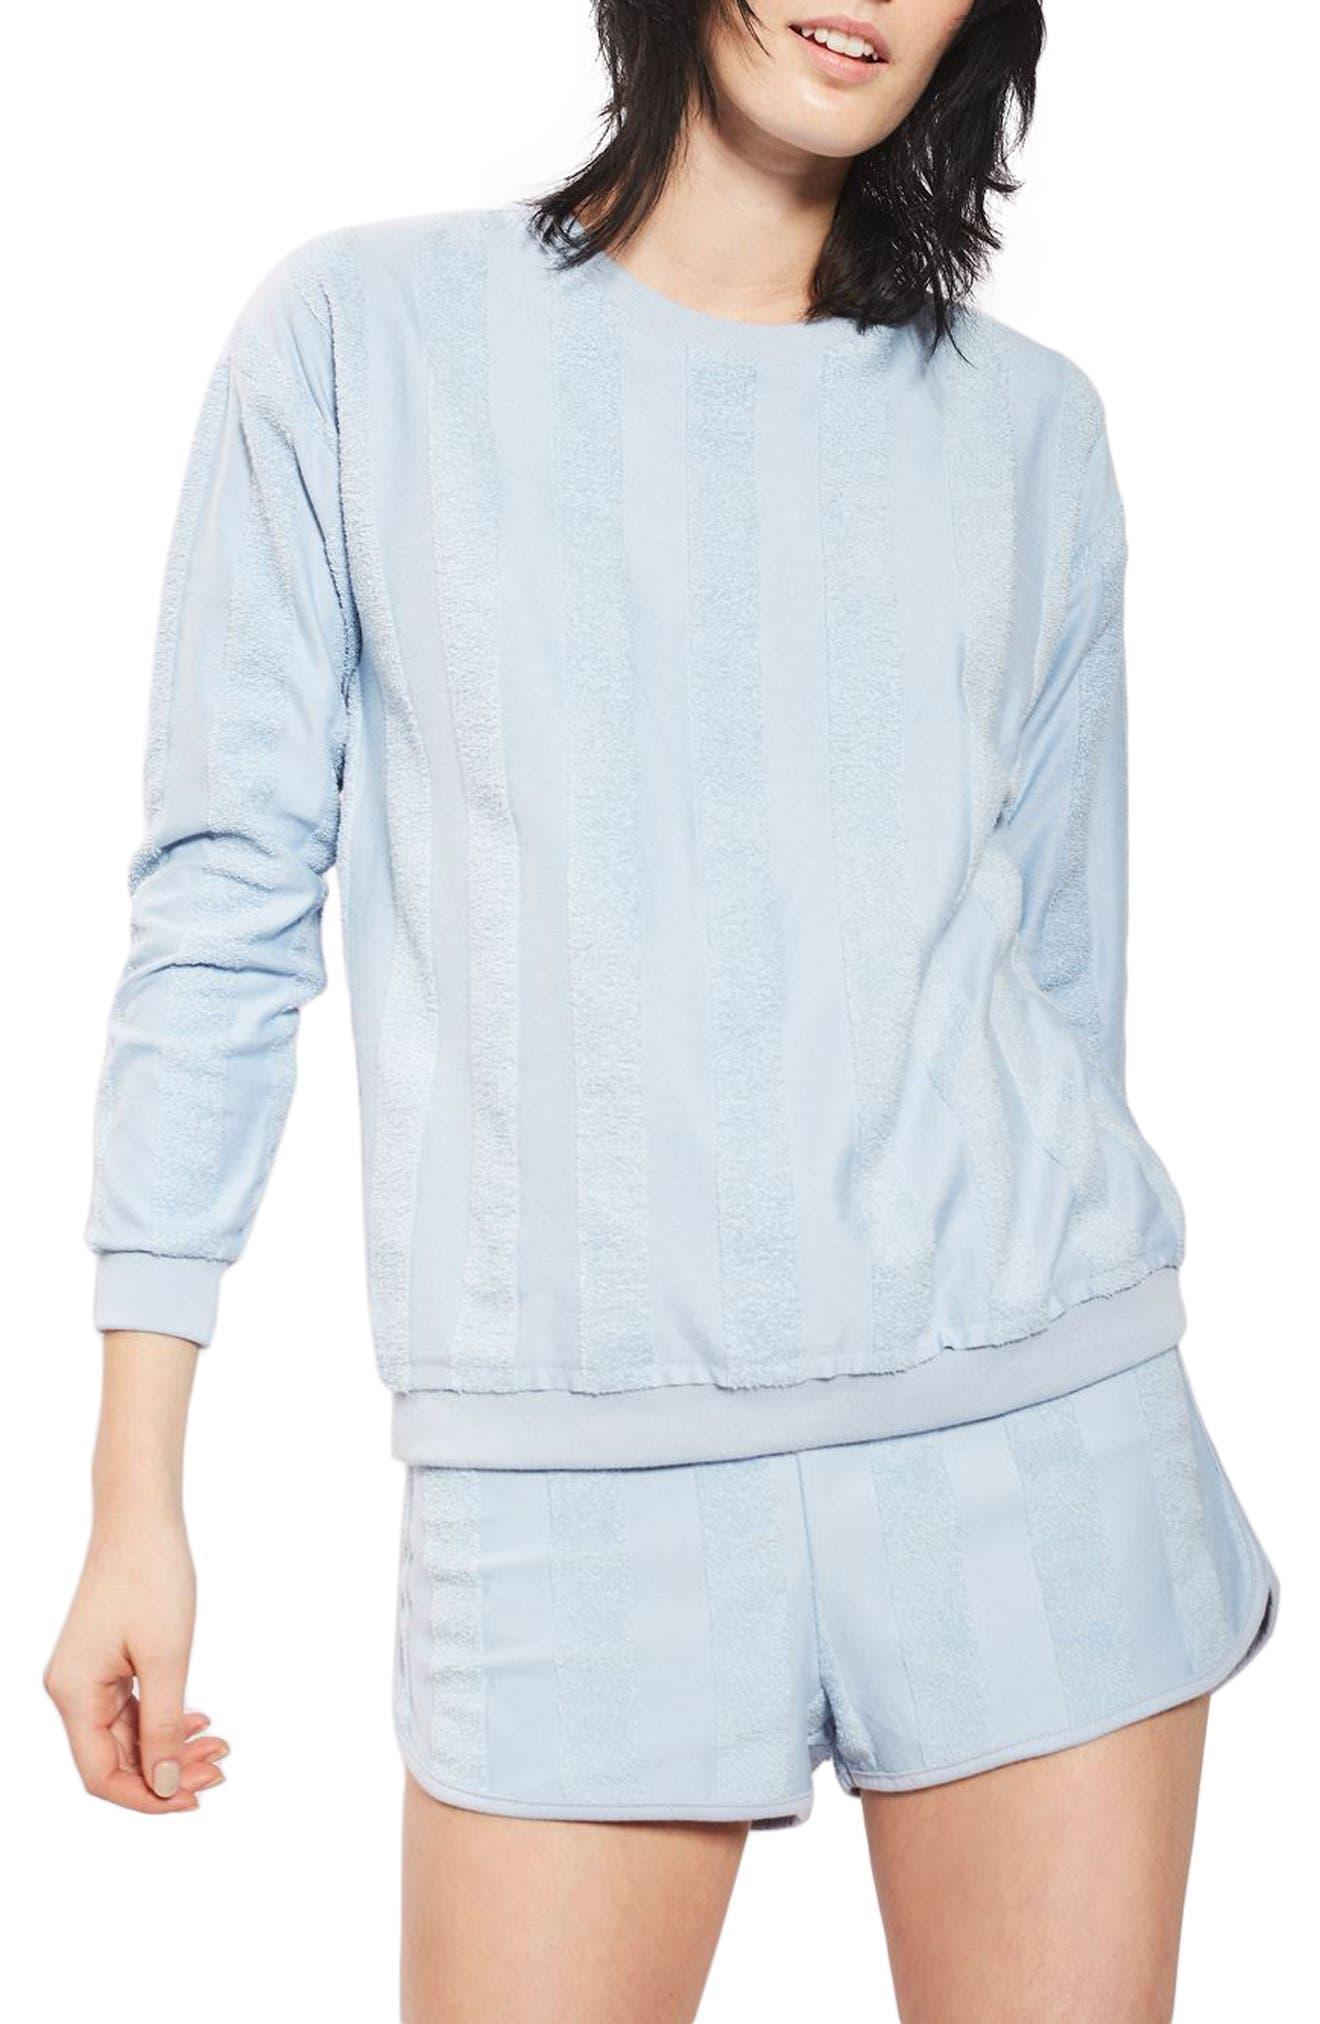 Towel Stripe Lounge Sweatshirt,                             Main thumbnail 1, color,                             450